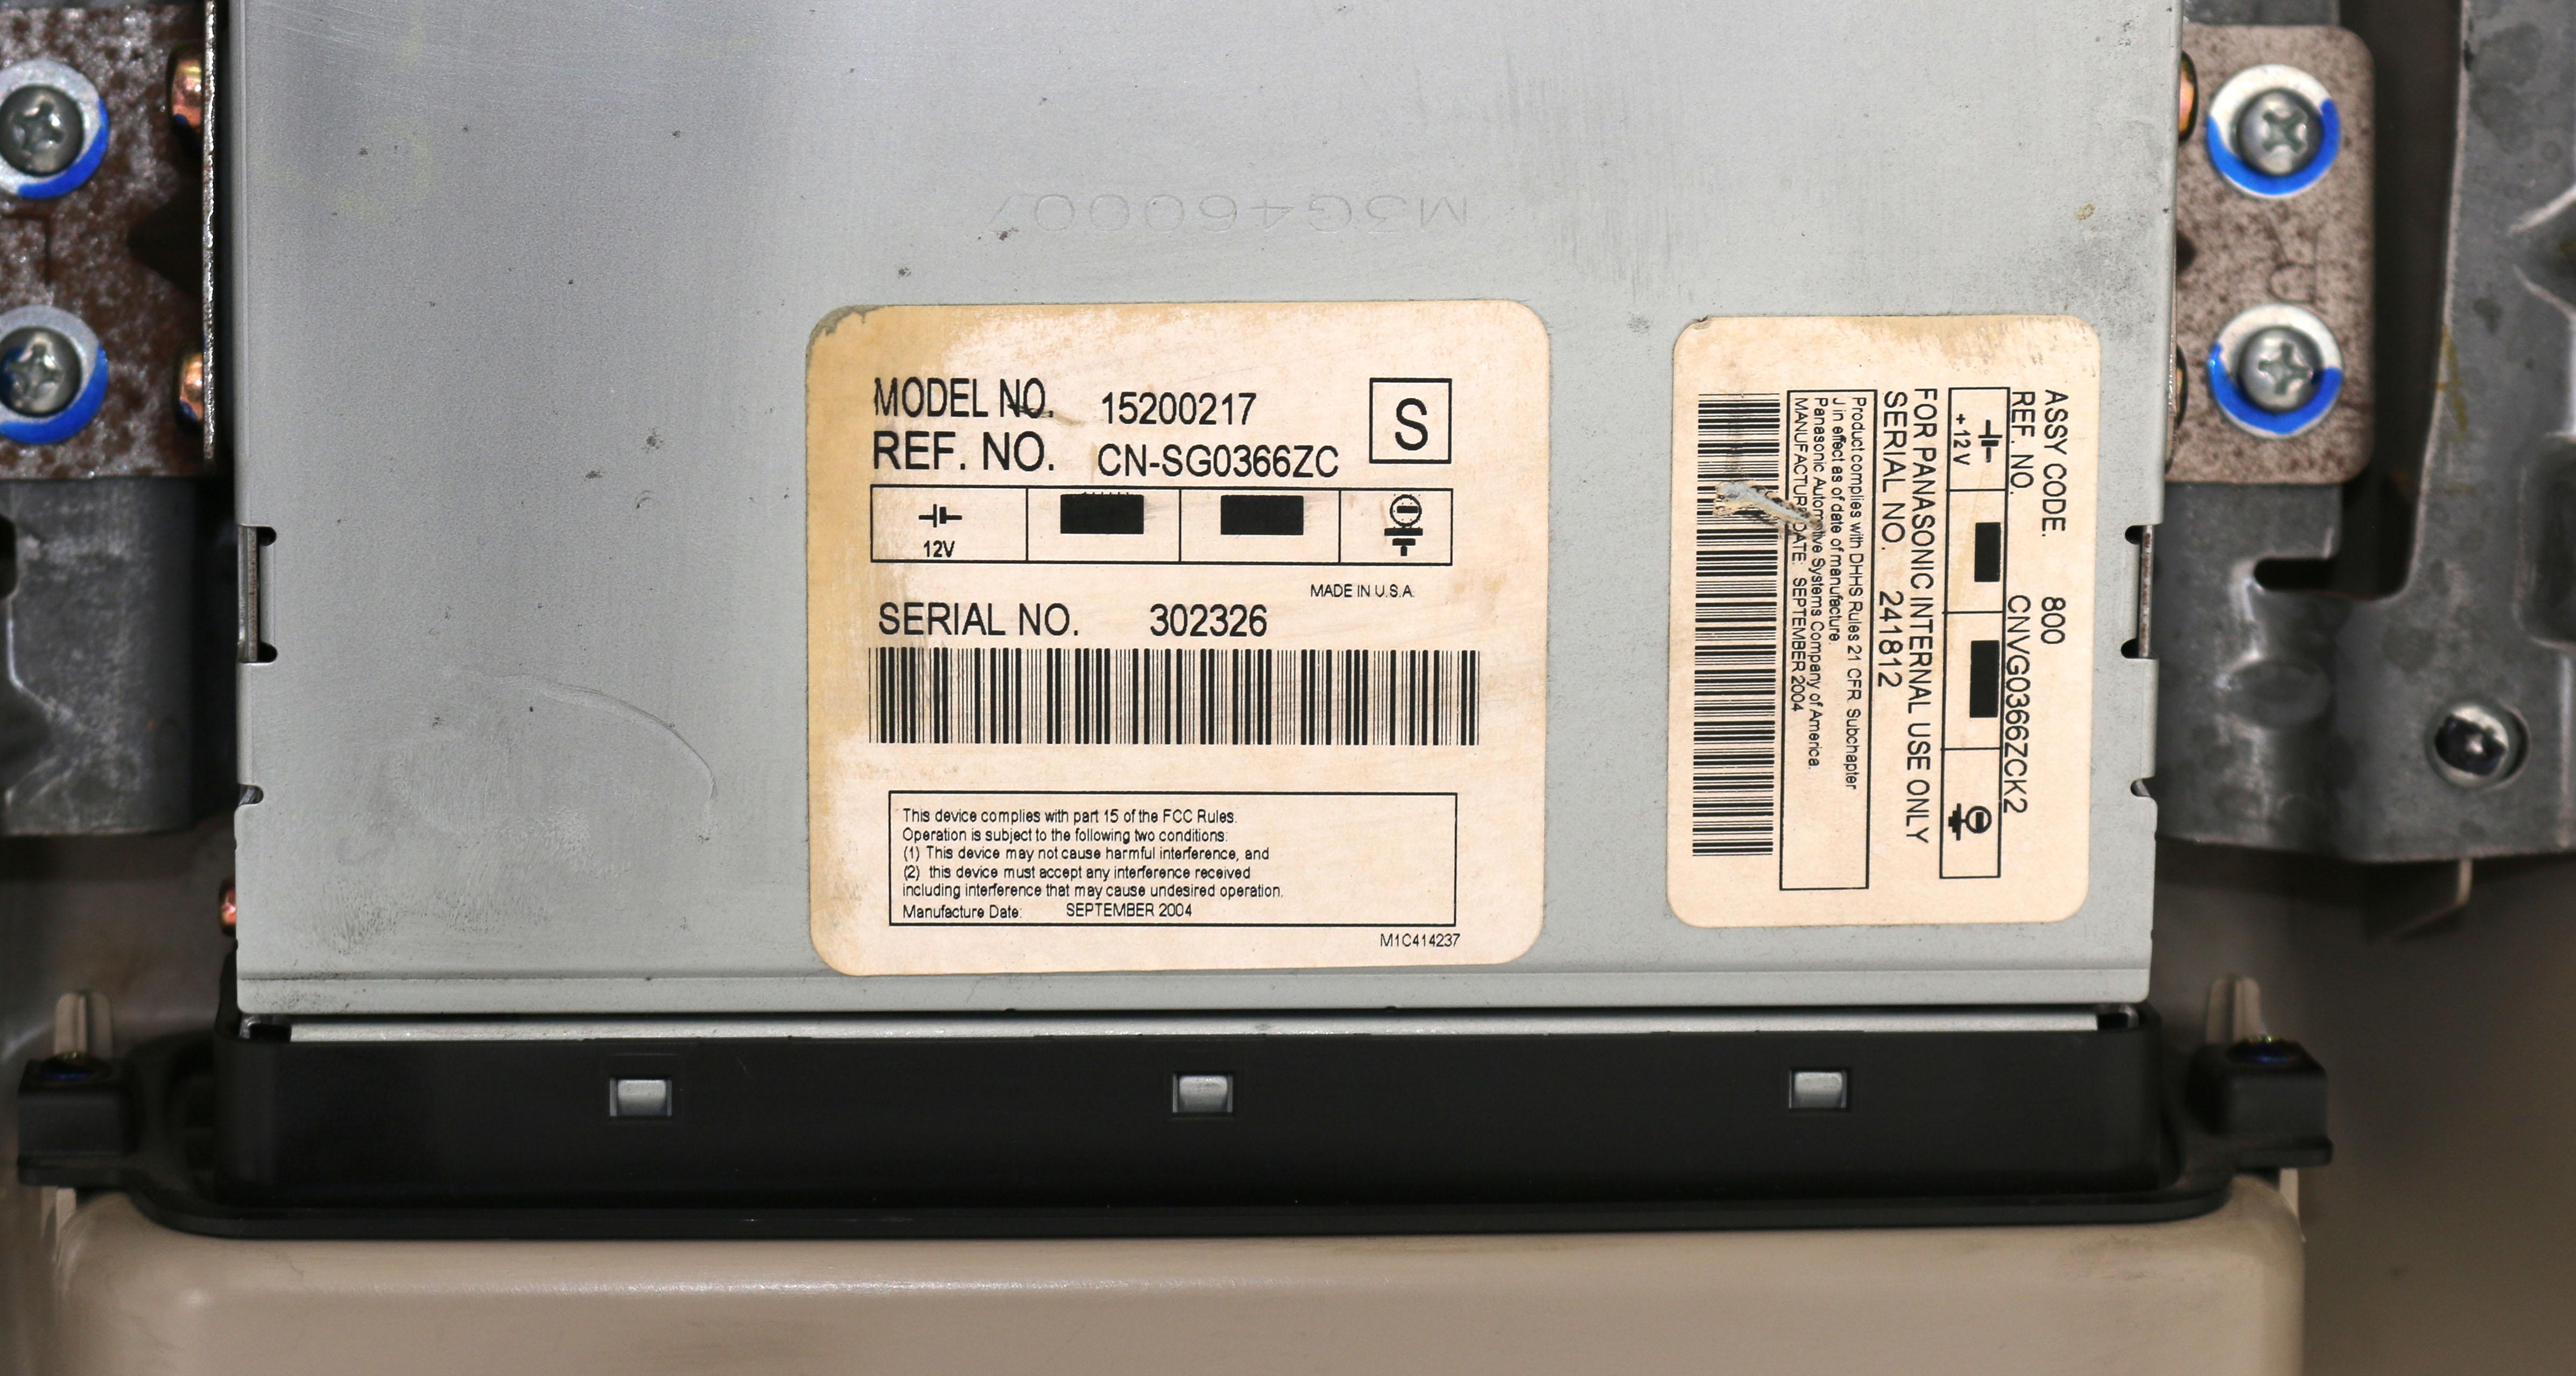 2005-07 chevy silverado 1500 panasonic entertainment system opt u42 on  universal car wiring diagram panasonic car dvd